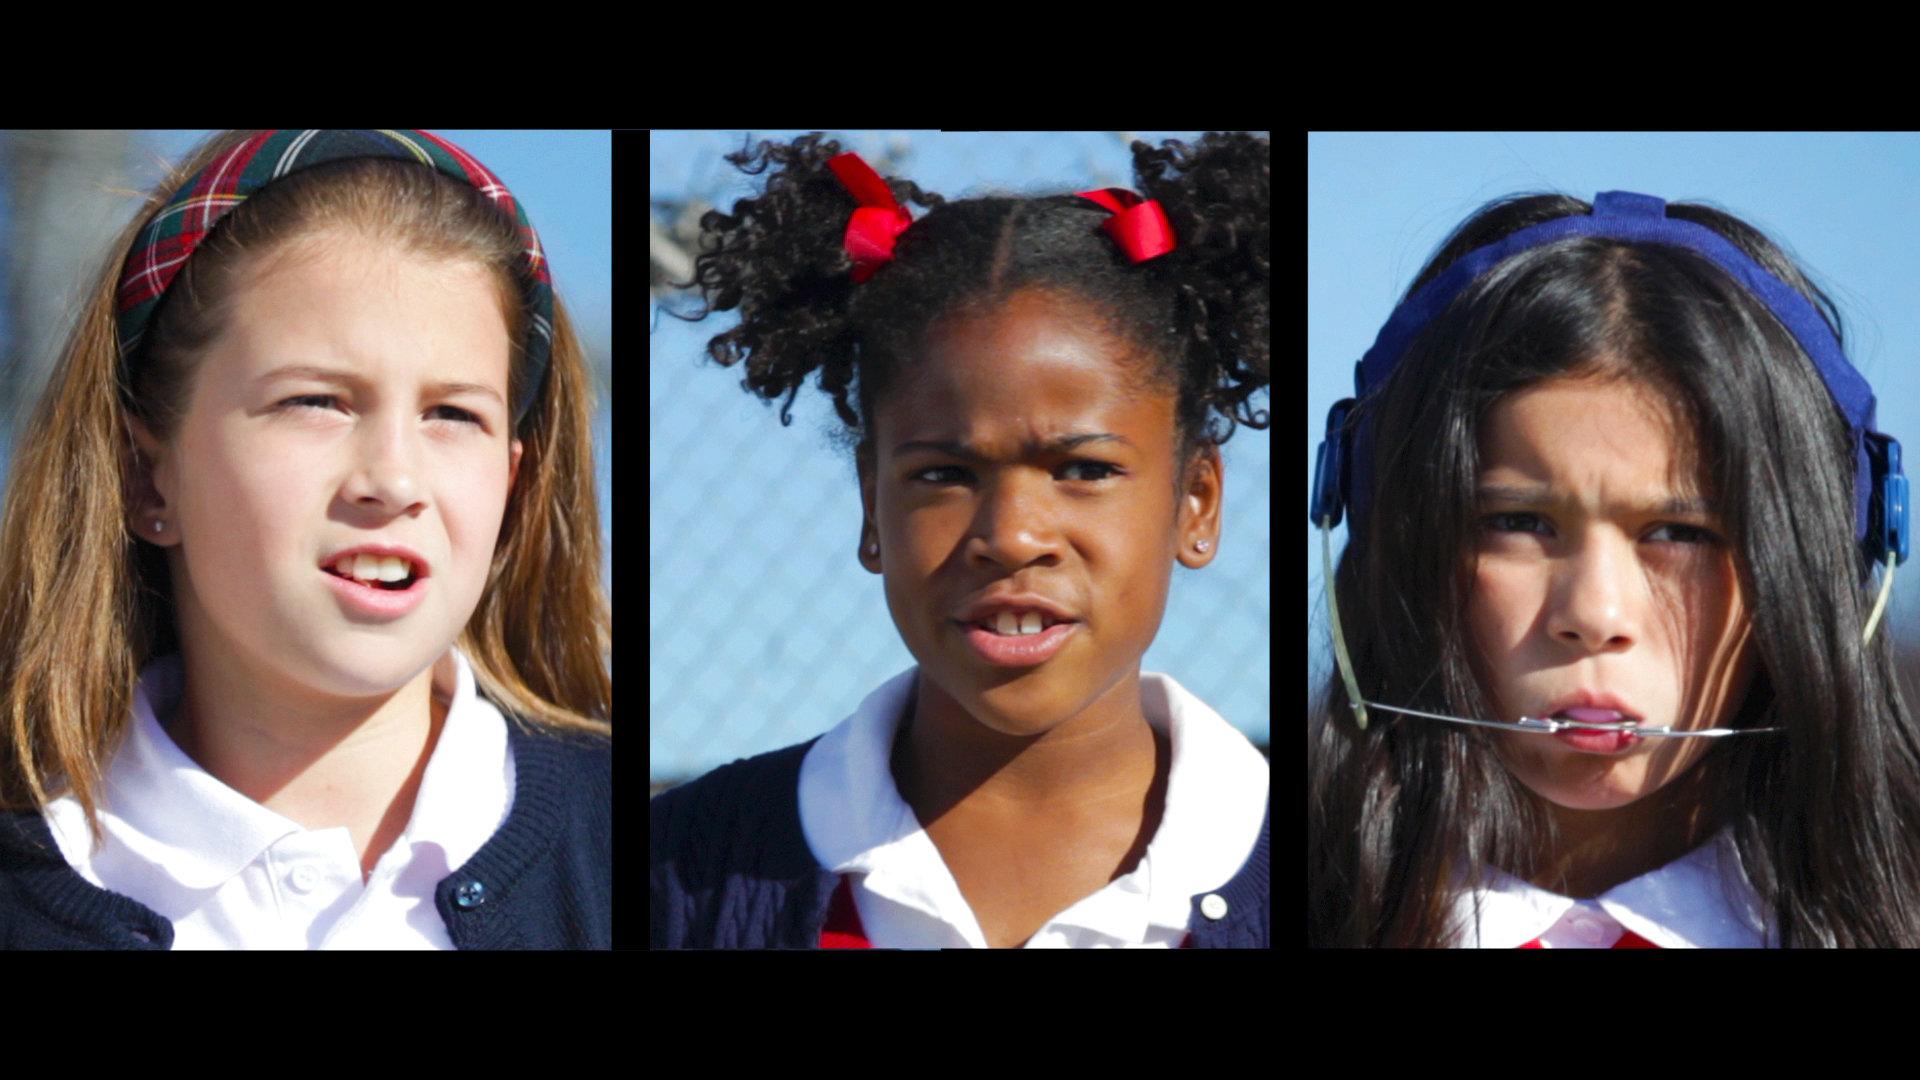 Alexa Hodzic as Rachel Melendez, Maleah Gallien as Chronicles Simpkins and Gianna Gomez as Jessica in Chronicles Simpkins Will Cut Your Ass, directed by Brendan Hughes.